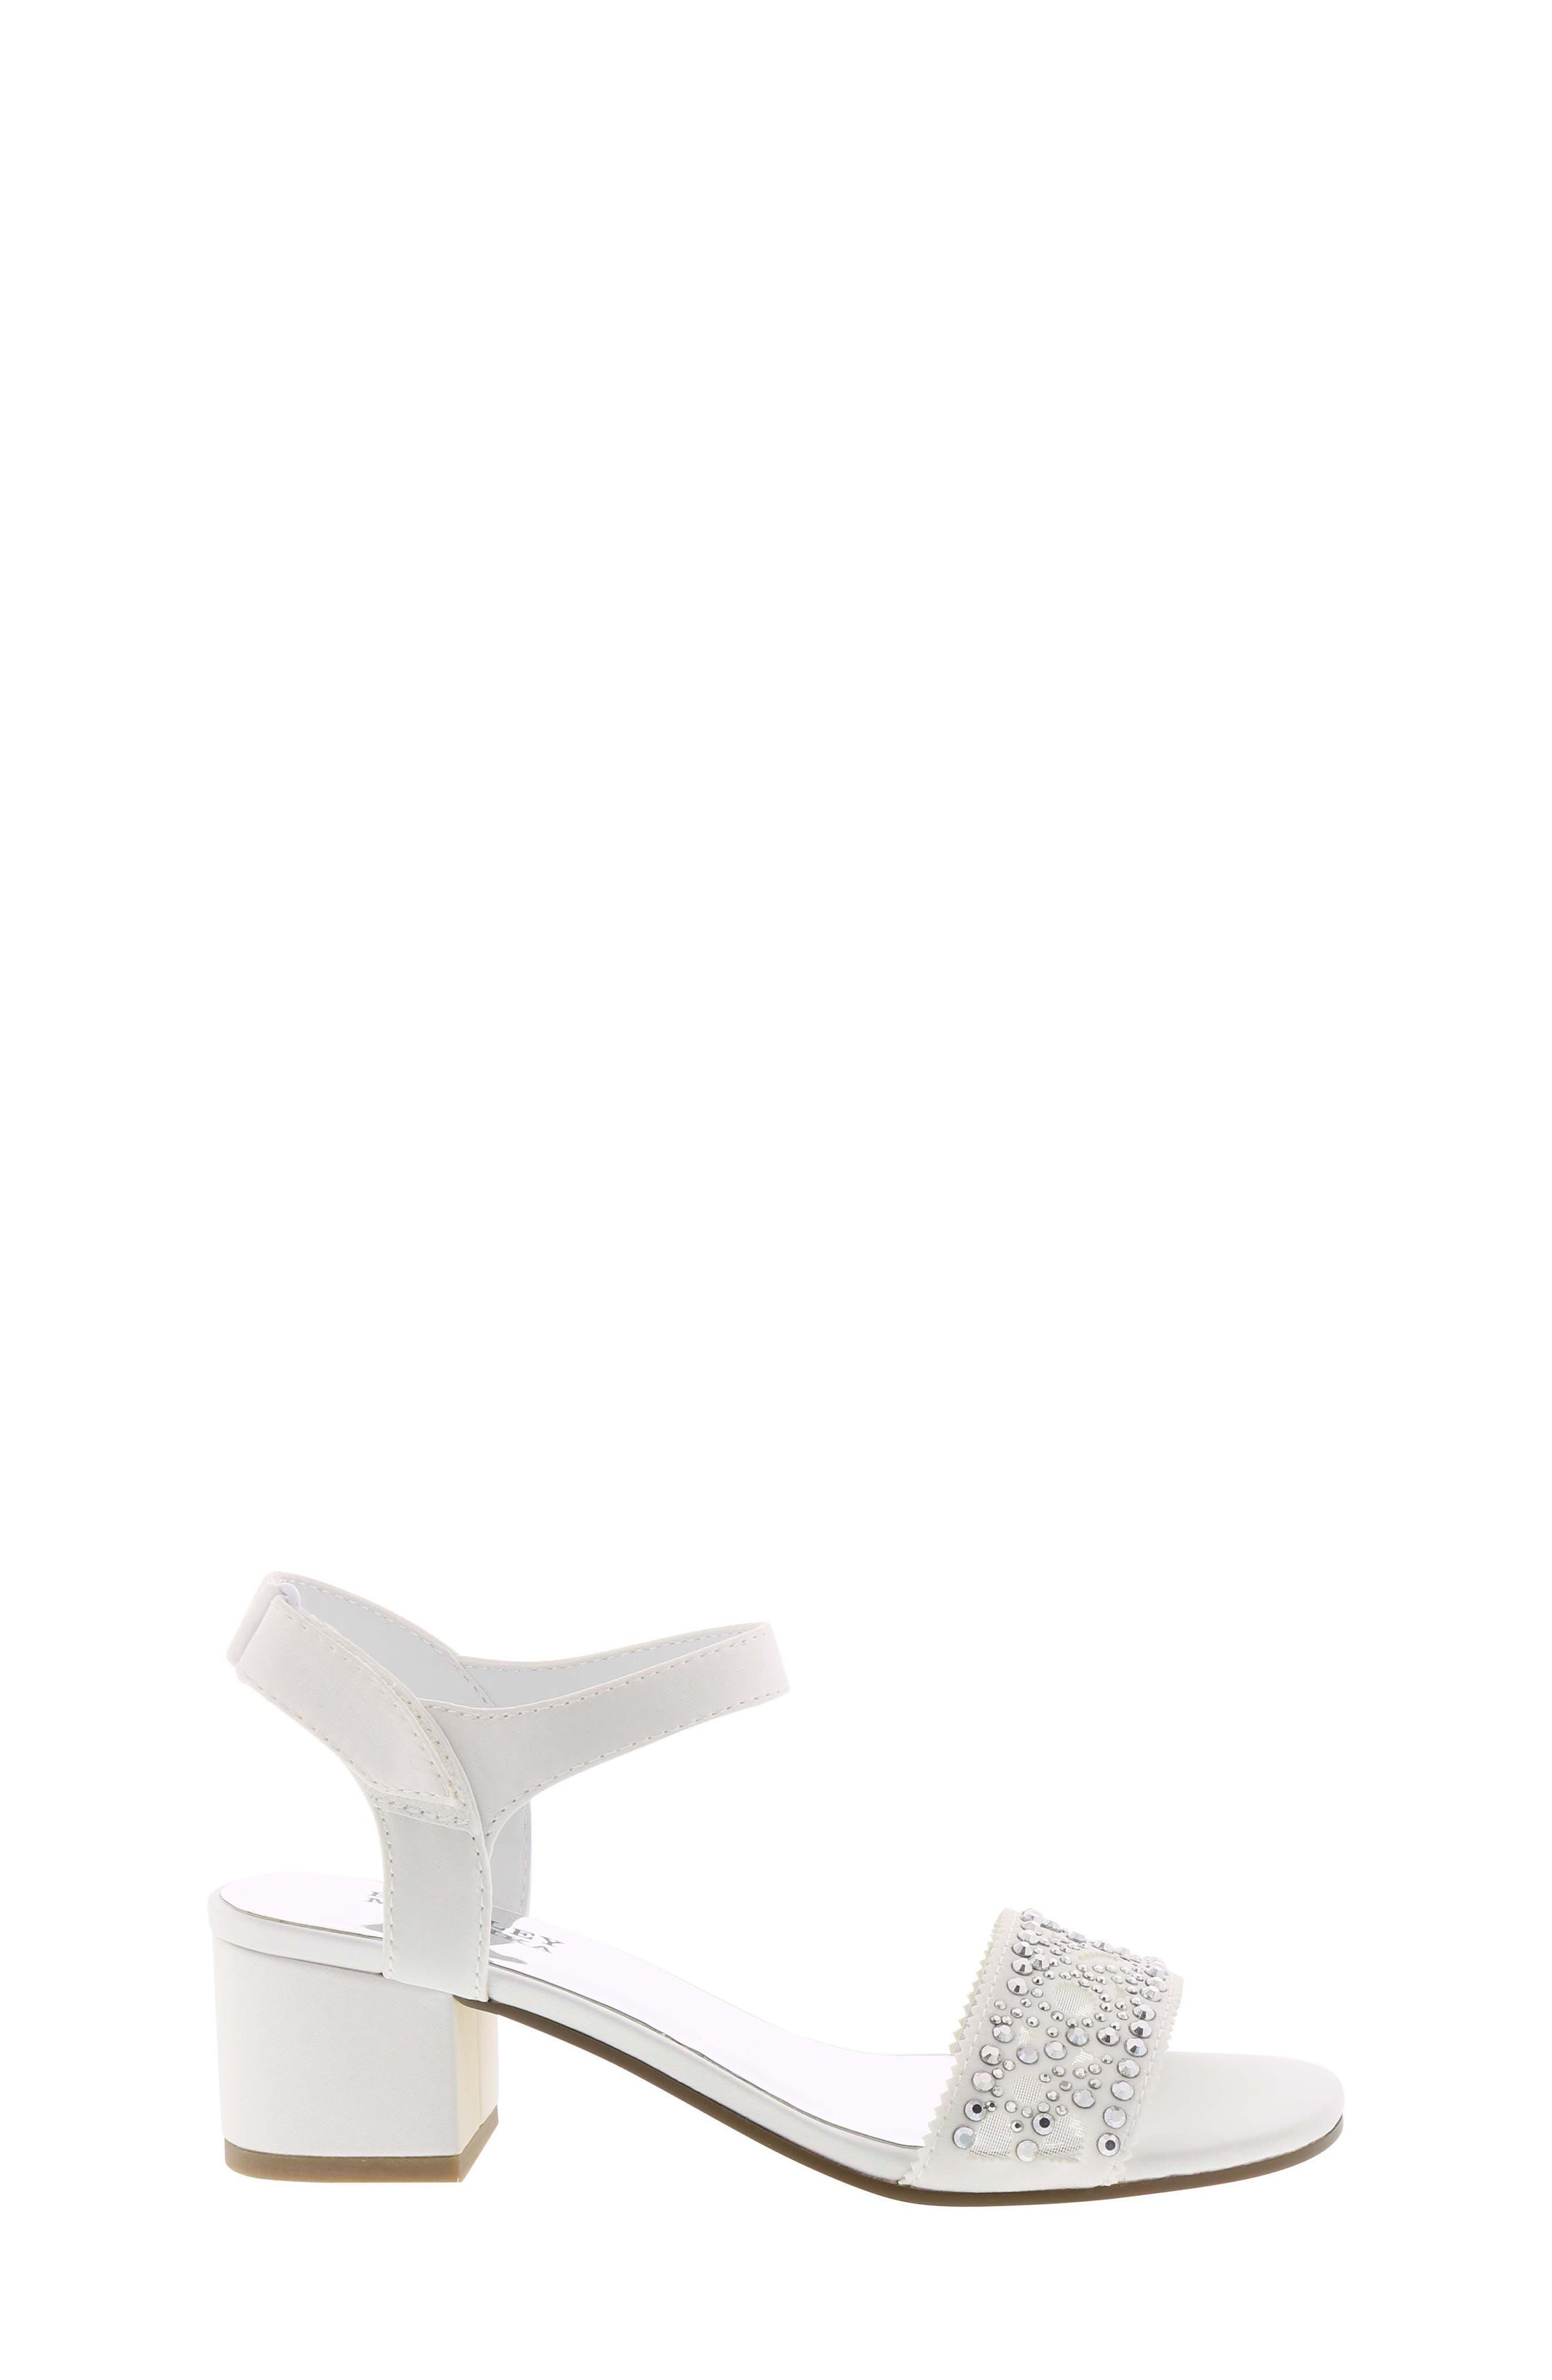 Ascot Gems Sandal,                             Alternate thumbnail 3, color,                             100